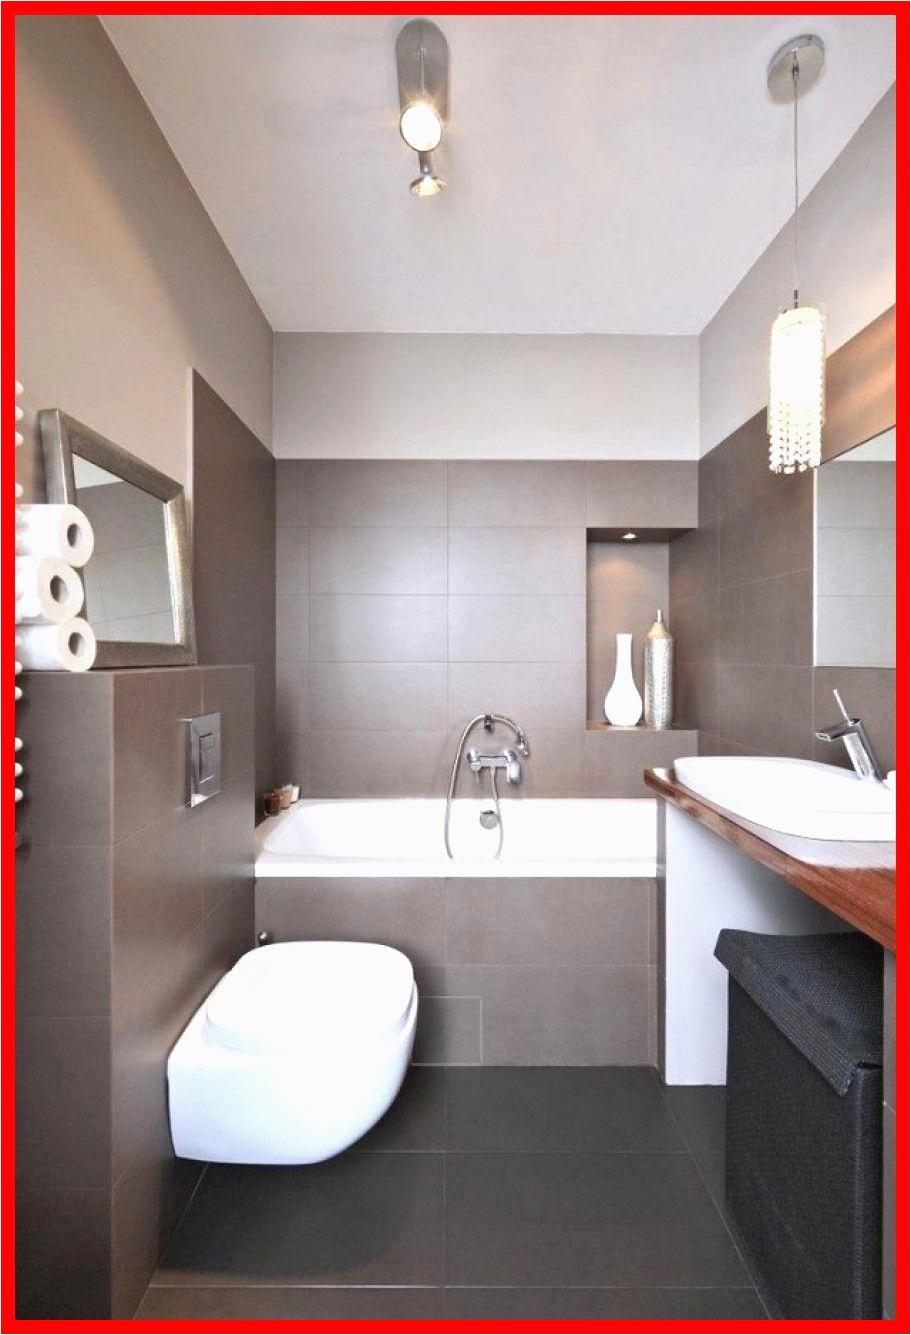 platten statt fliesen im bad genial badezimmer ideen fliesen design fliesen schon kupfer fliesen 0d das of platten statt fliesen im bad